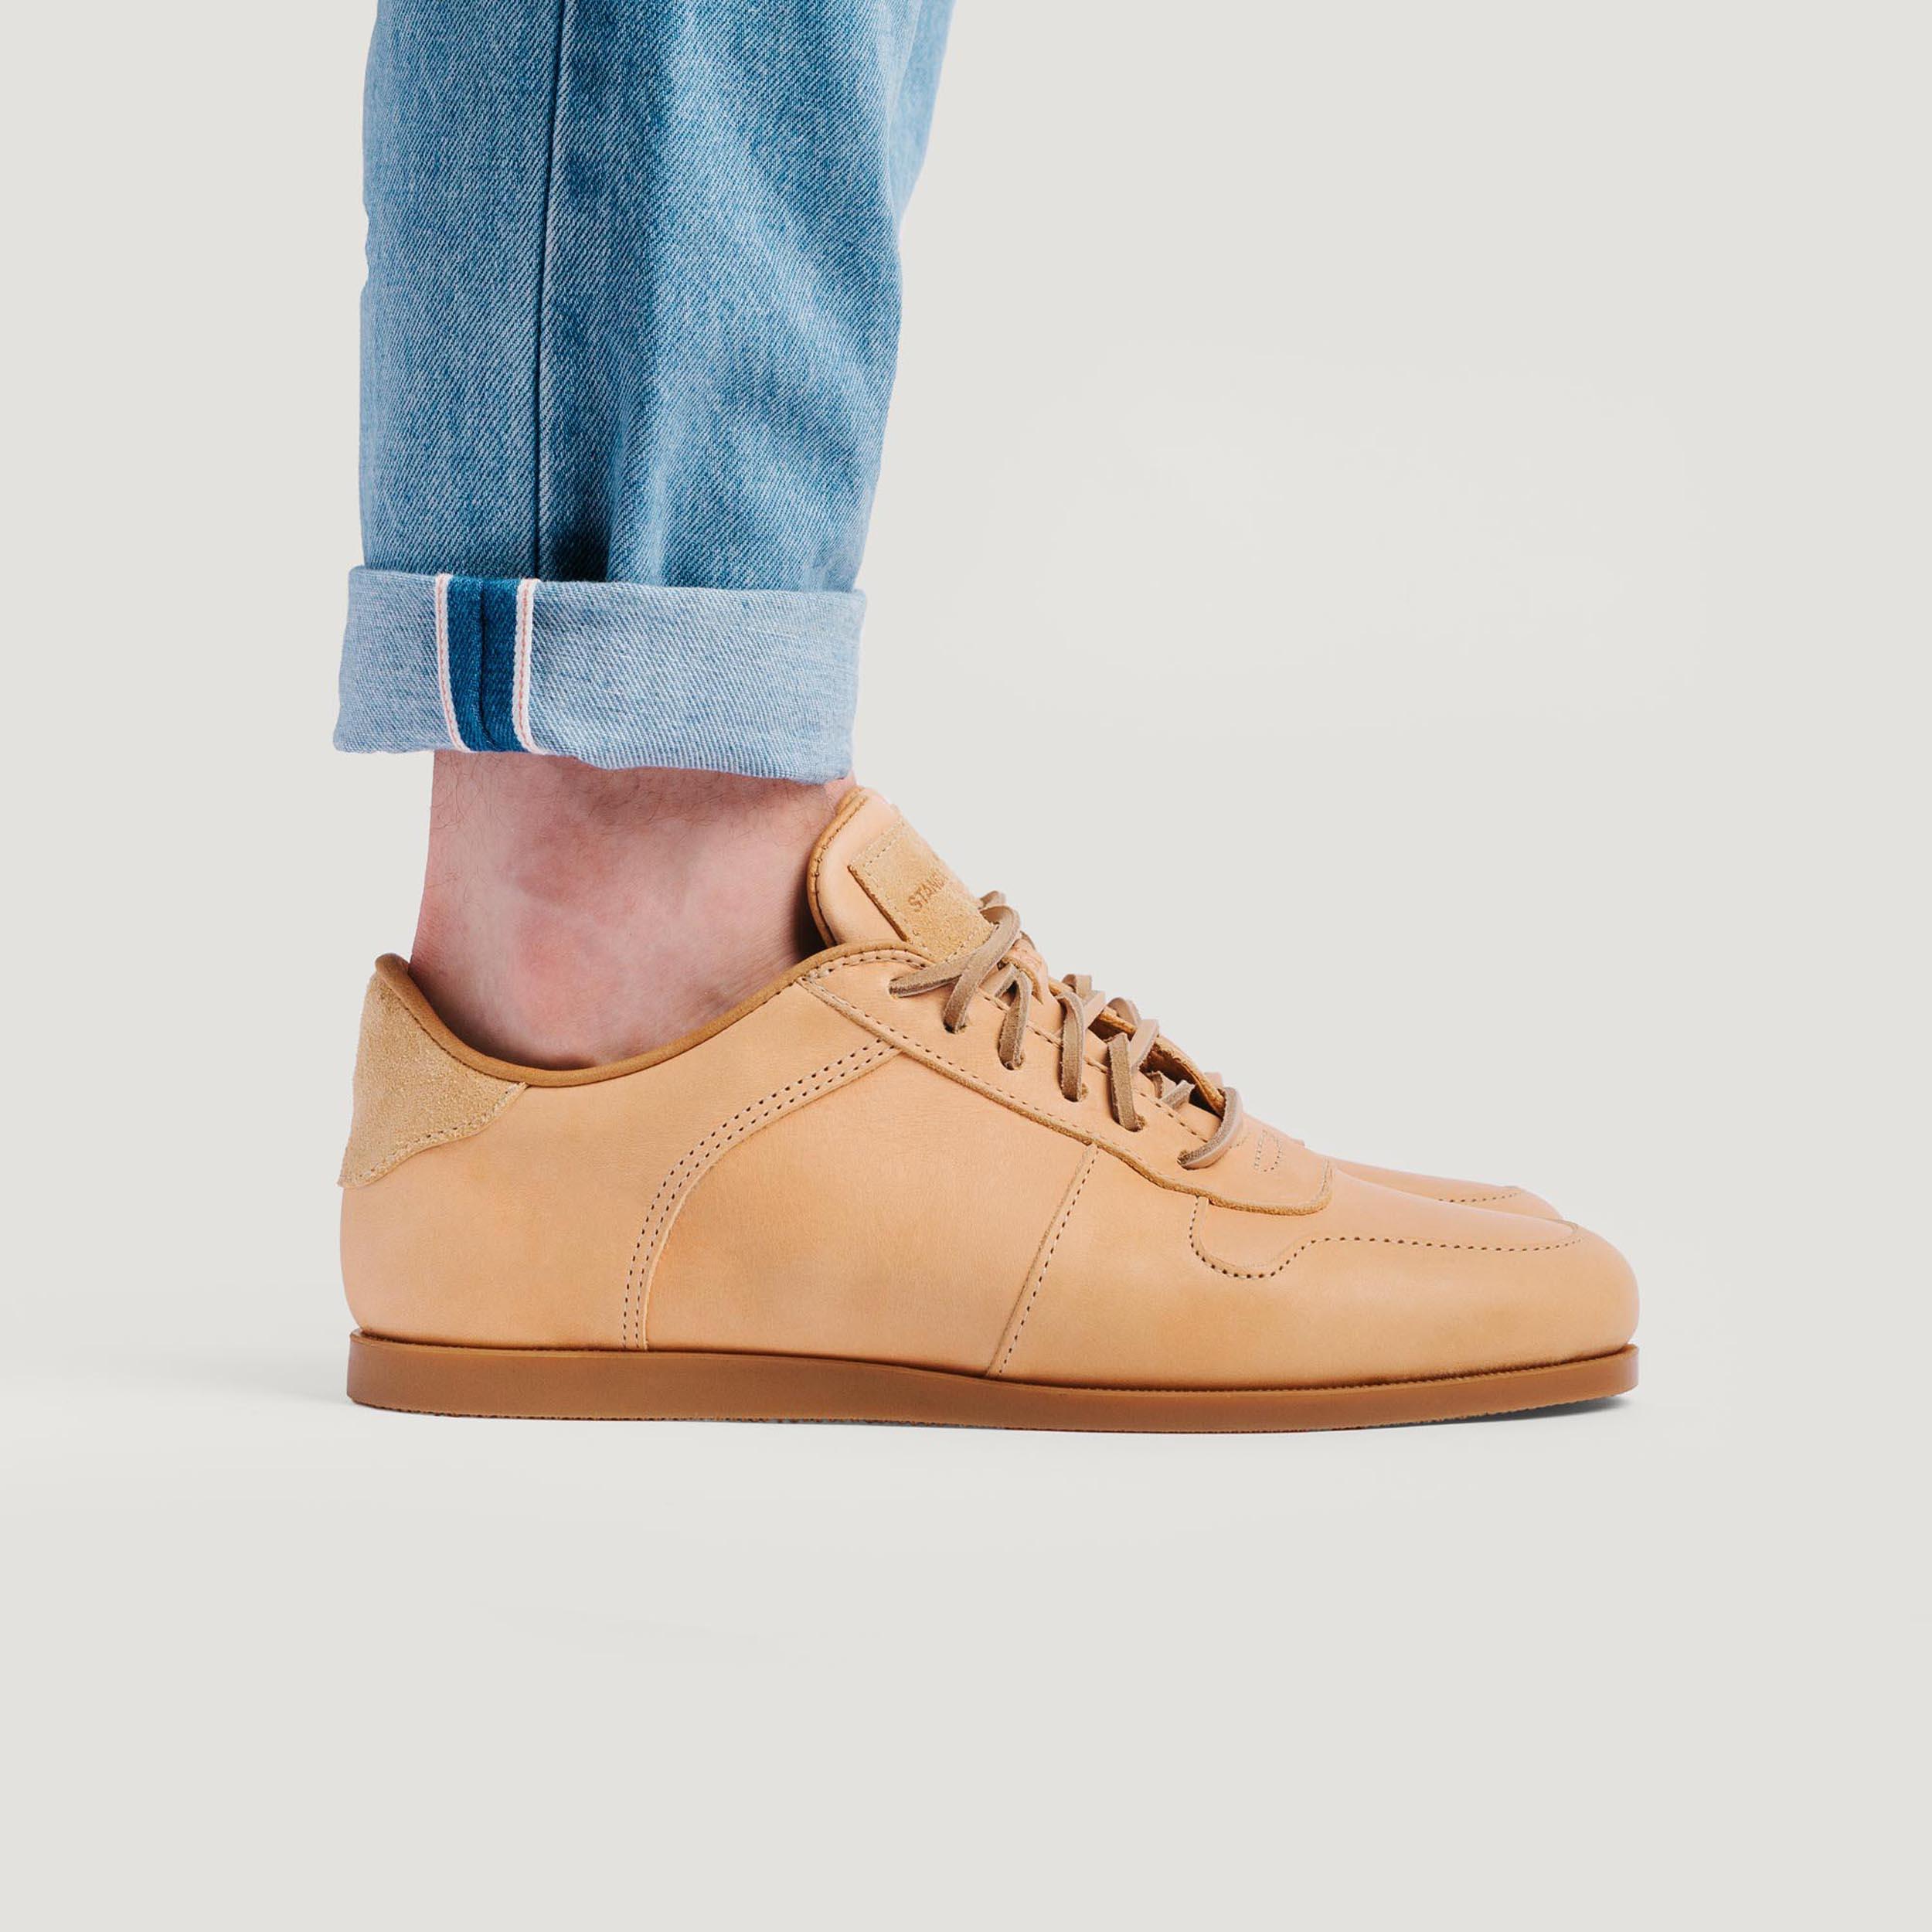 on-foot-side-profile-honey